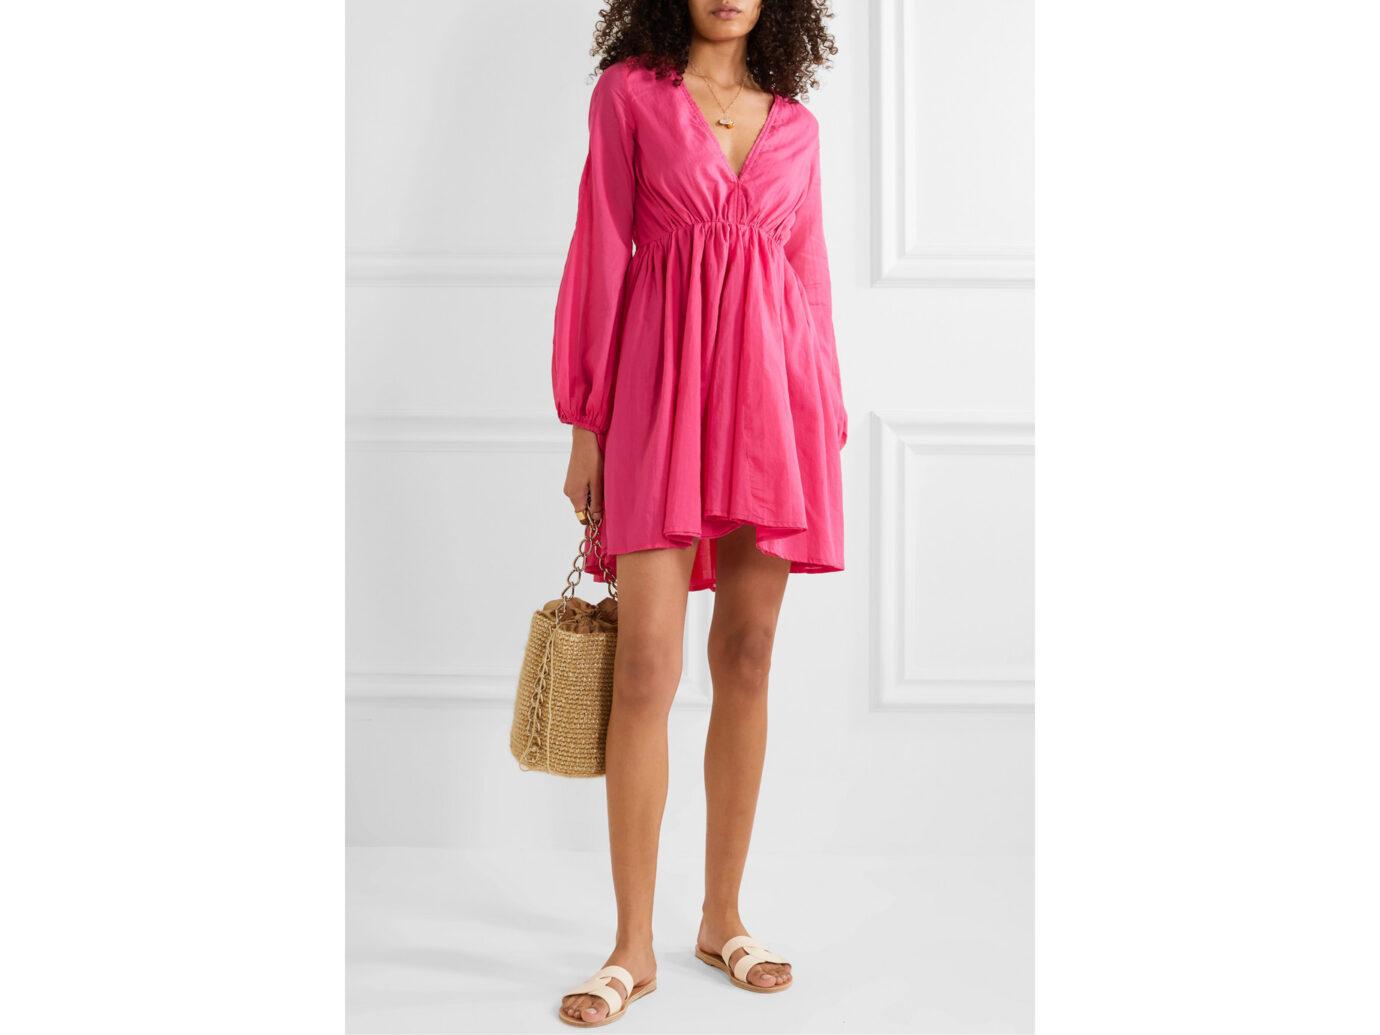 Kalita Aphrodite Mini Dress